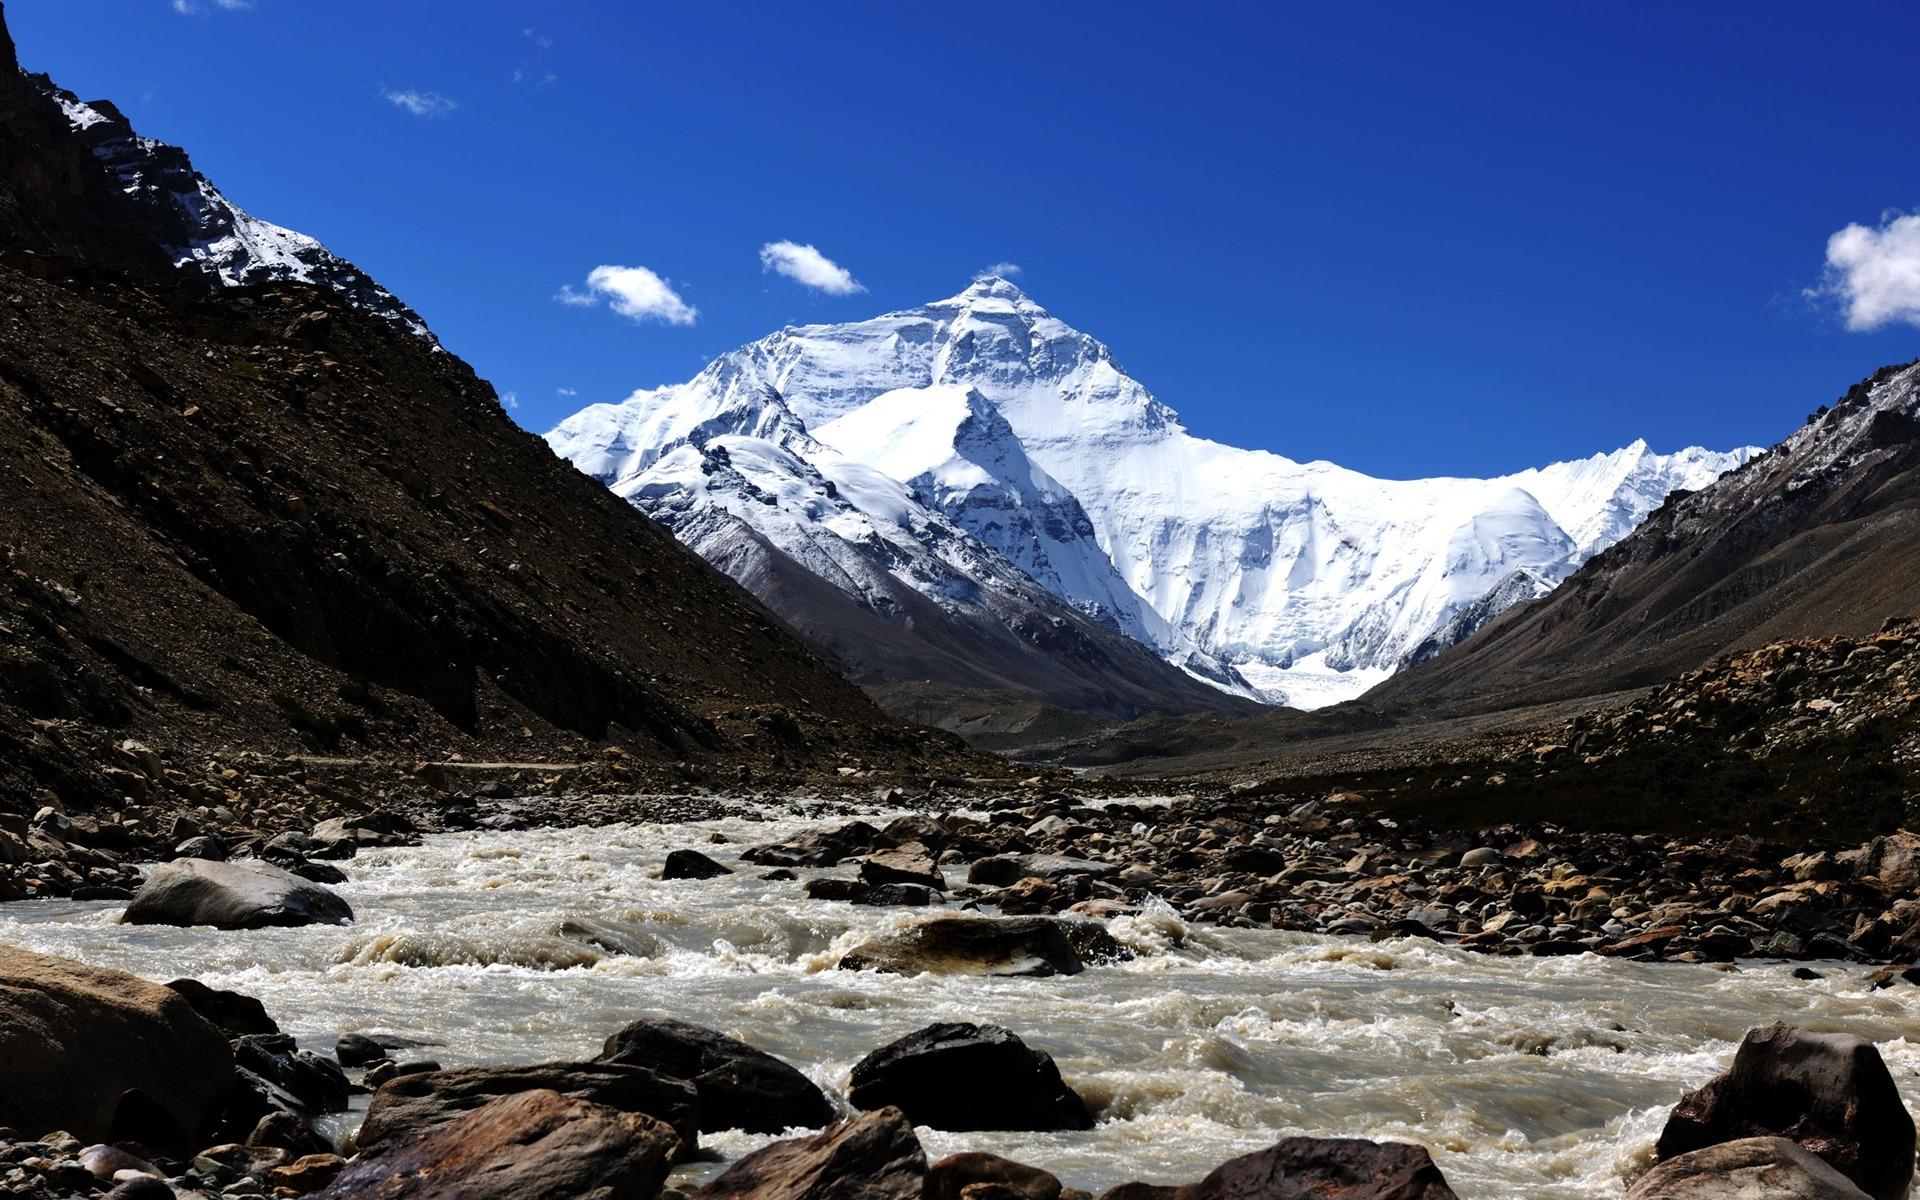 tibet snow mountain scenic wallpaper fonds d cran tibet pc et 1920x1200